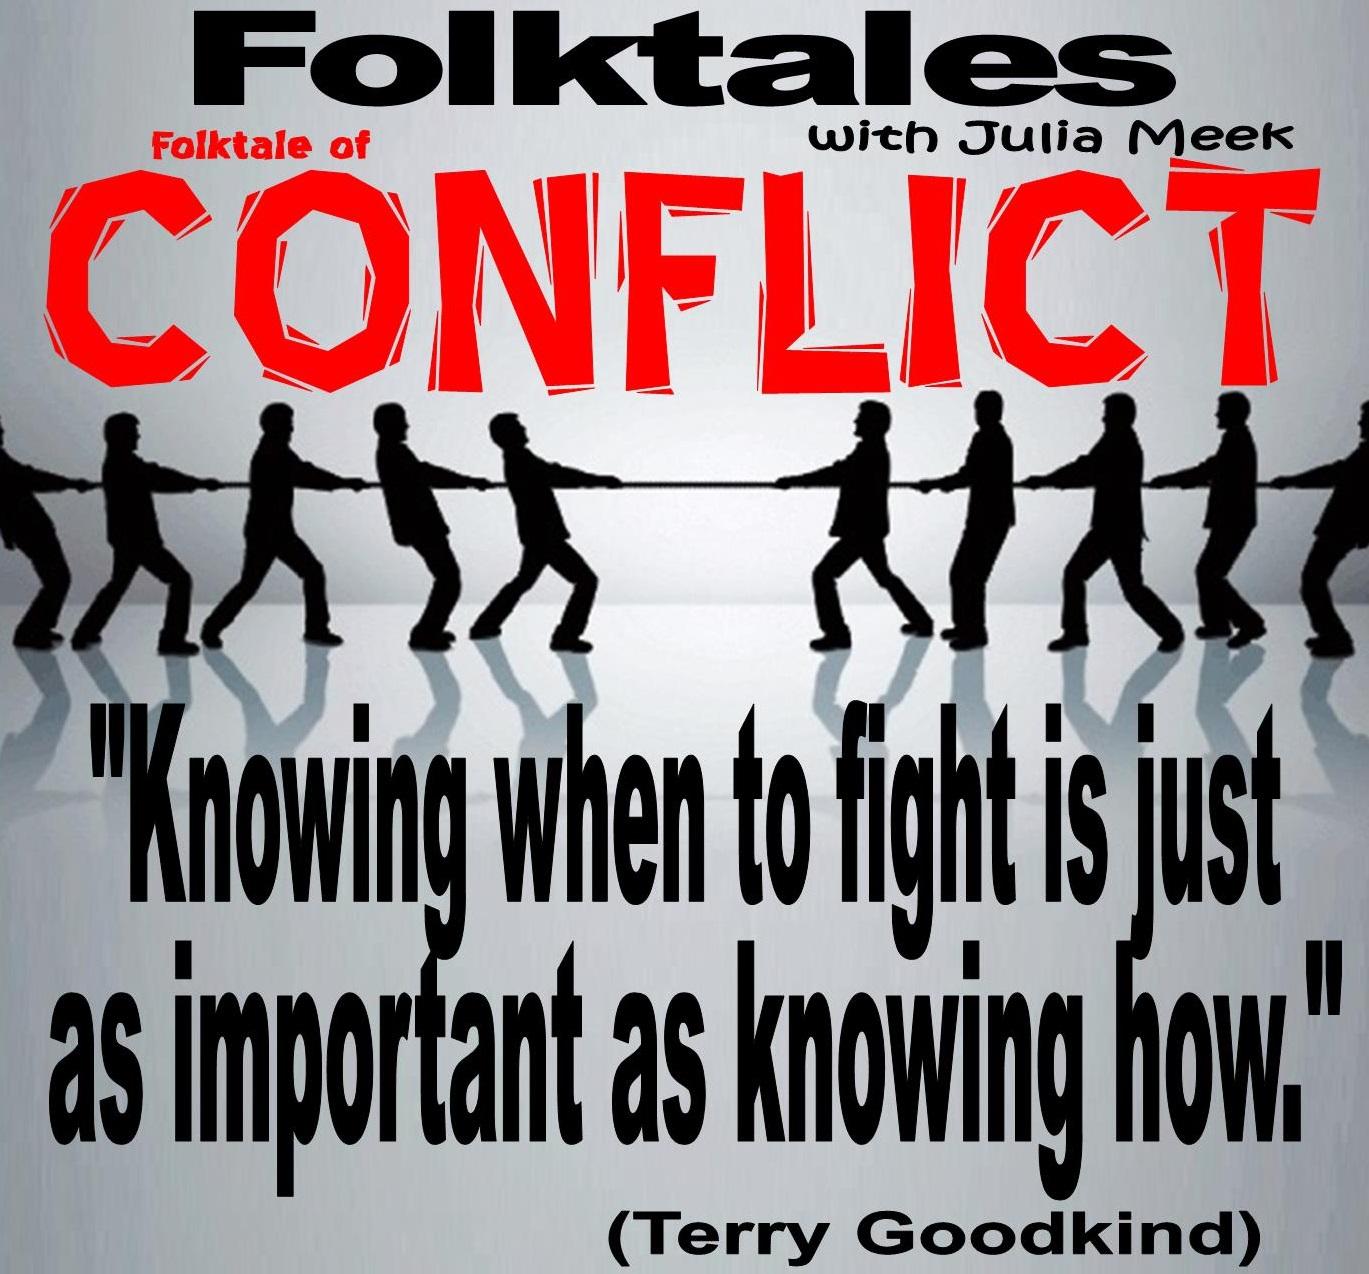 Caption: WBOI's Folktale of Conflict, Credit: Julia Meek